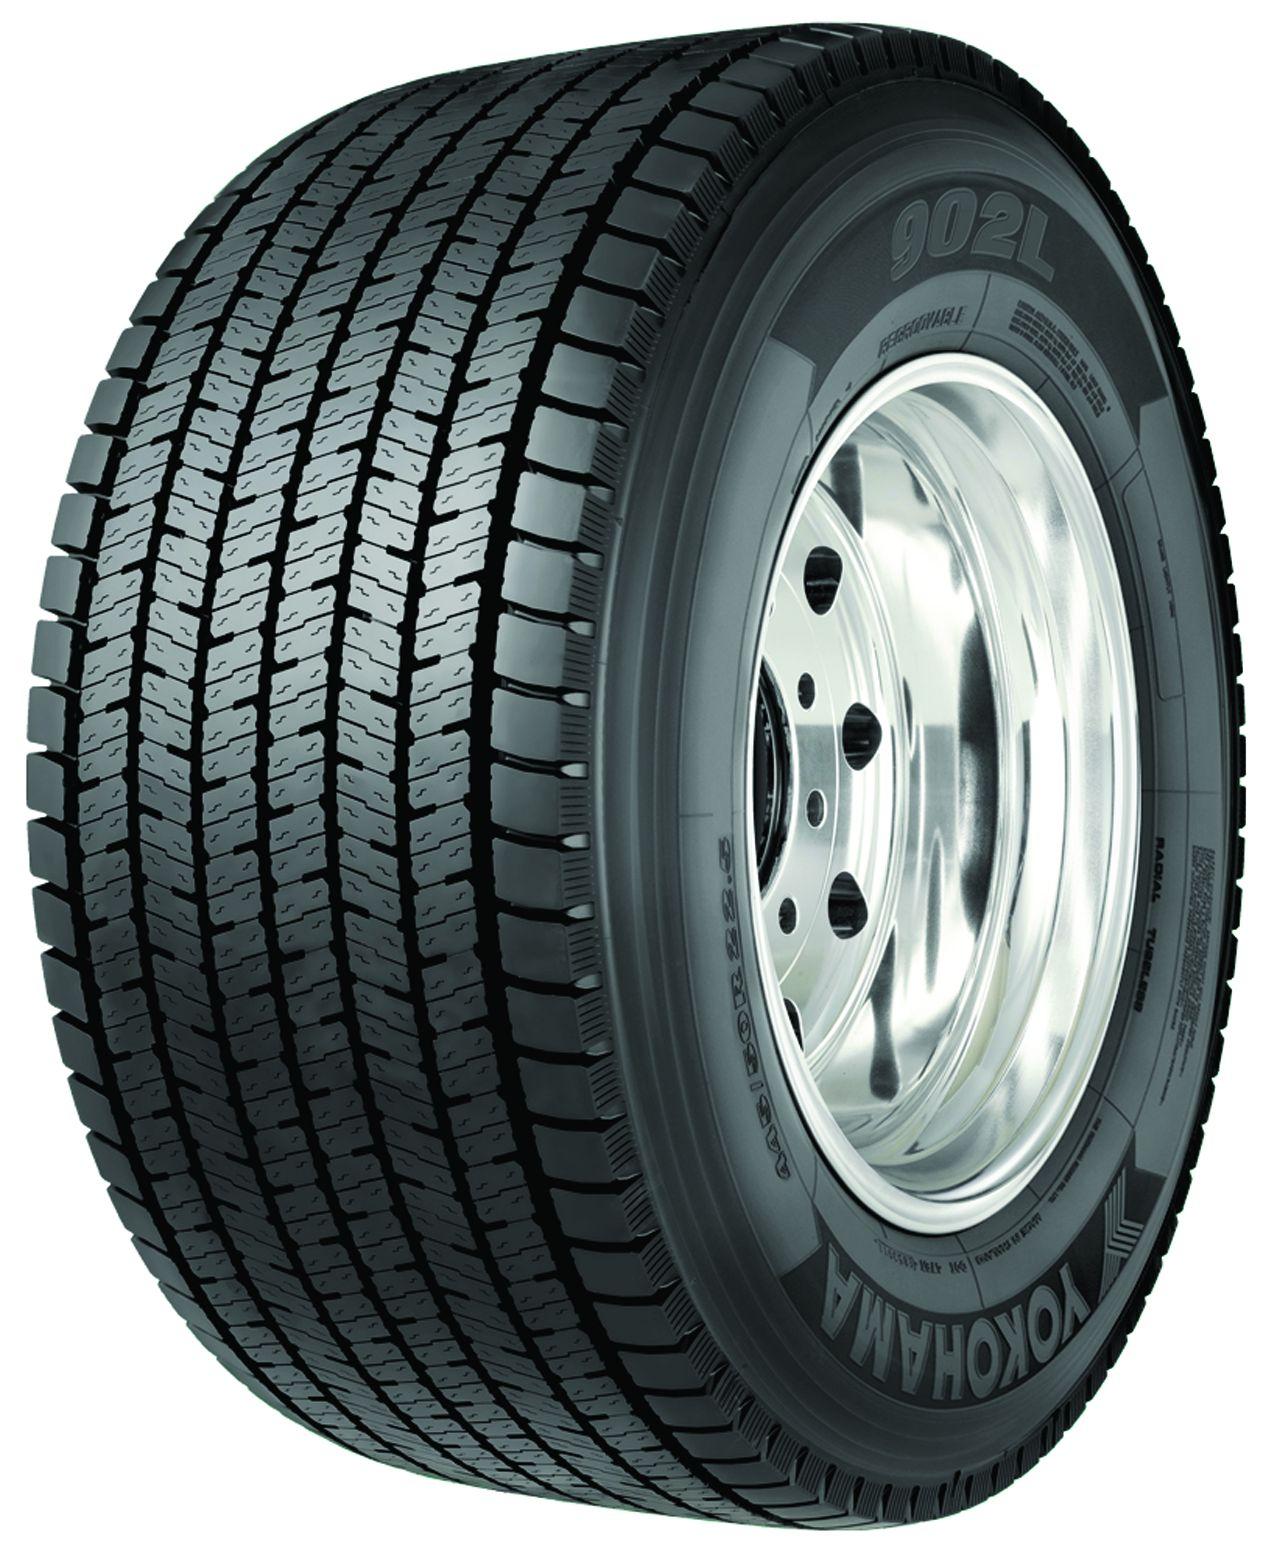 Yokohama 902L Ultra-Wide-Base Tire